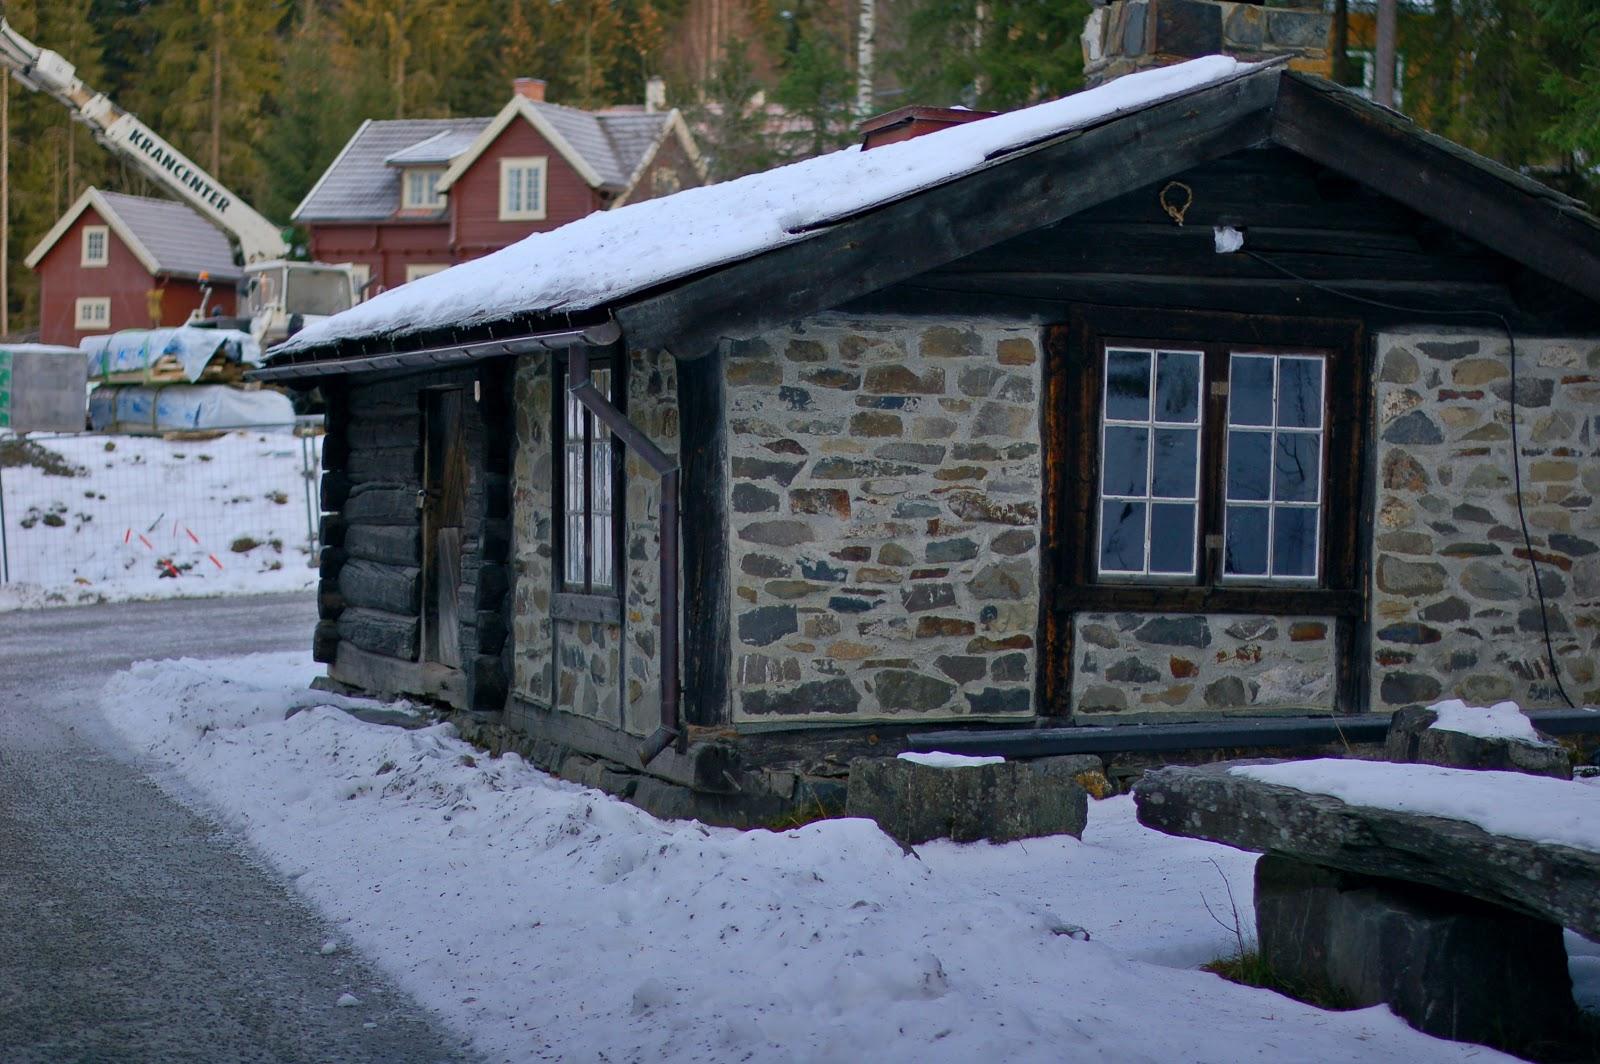 maihaugen em lillehammer no inverno